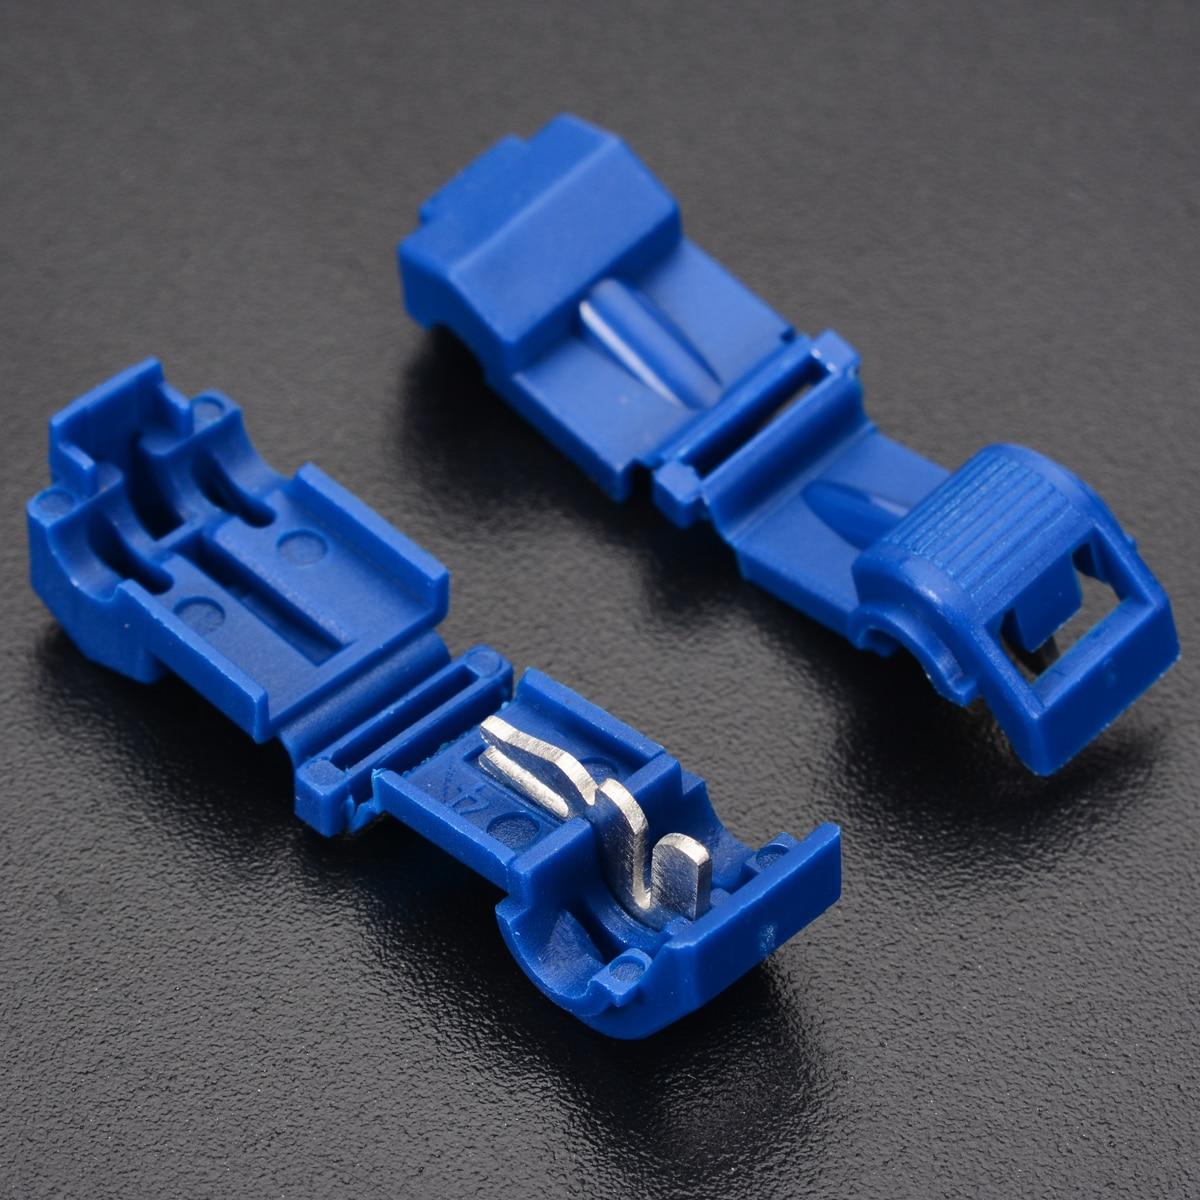 40pcs/lot T-Taps & Male Insulated Wire Cable Connector Terminals Mini Blue Quick Splice Scotch Lock Terminal Crimp